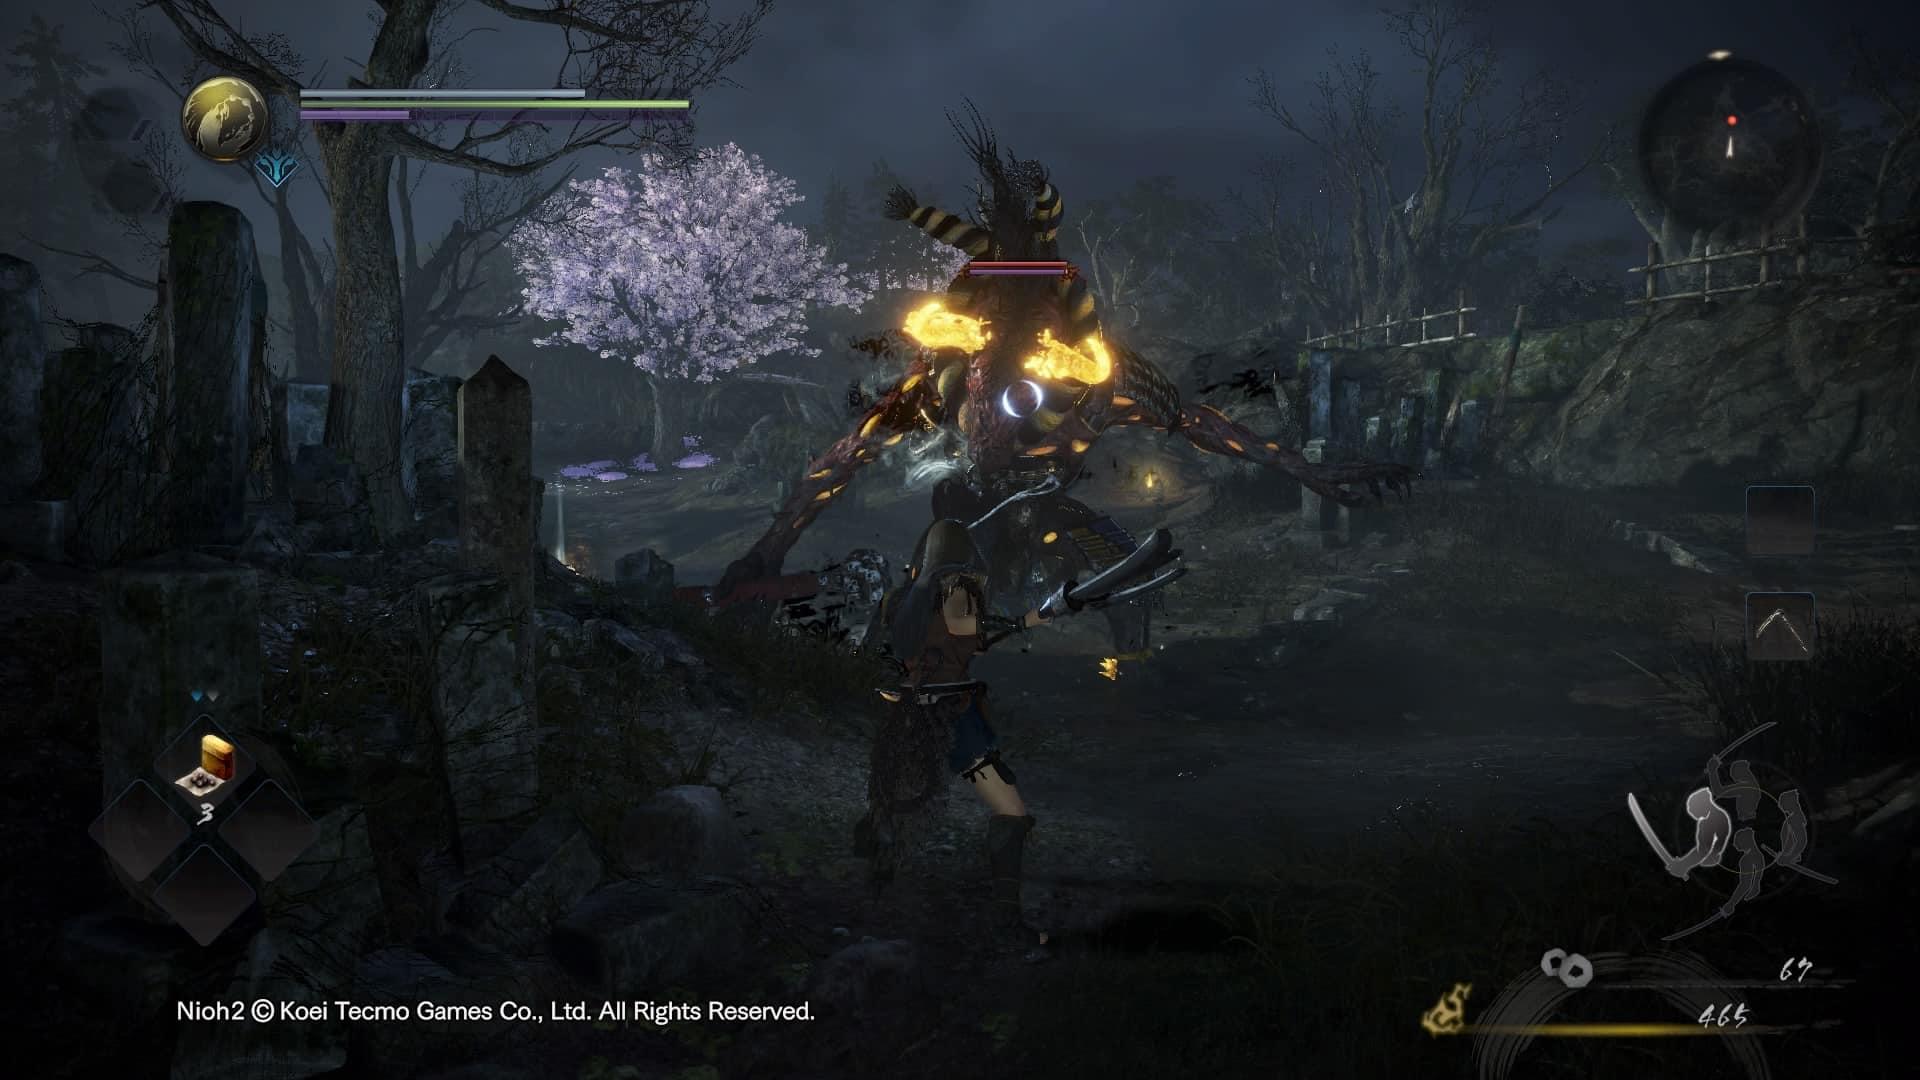 Nioh2 screenshot 2